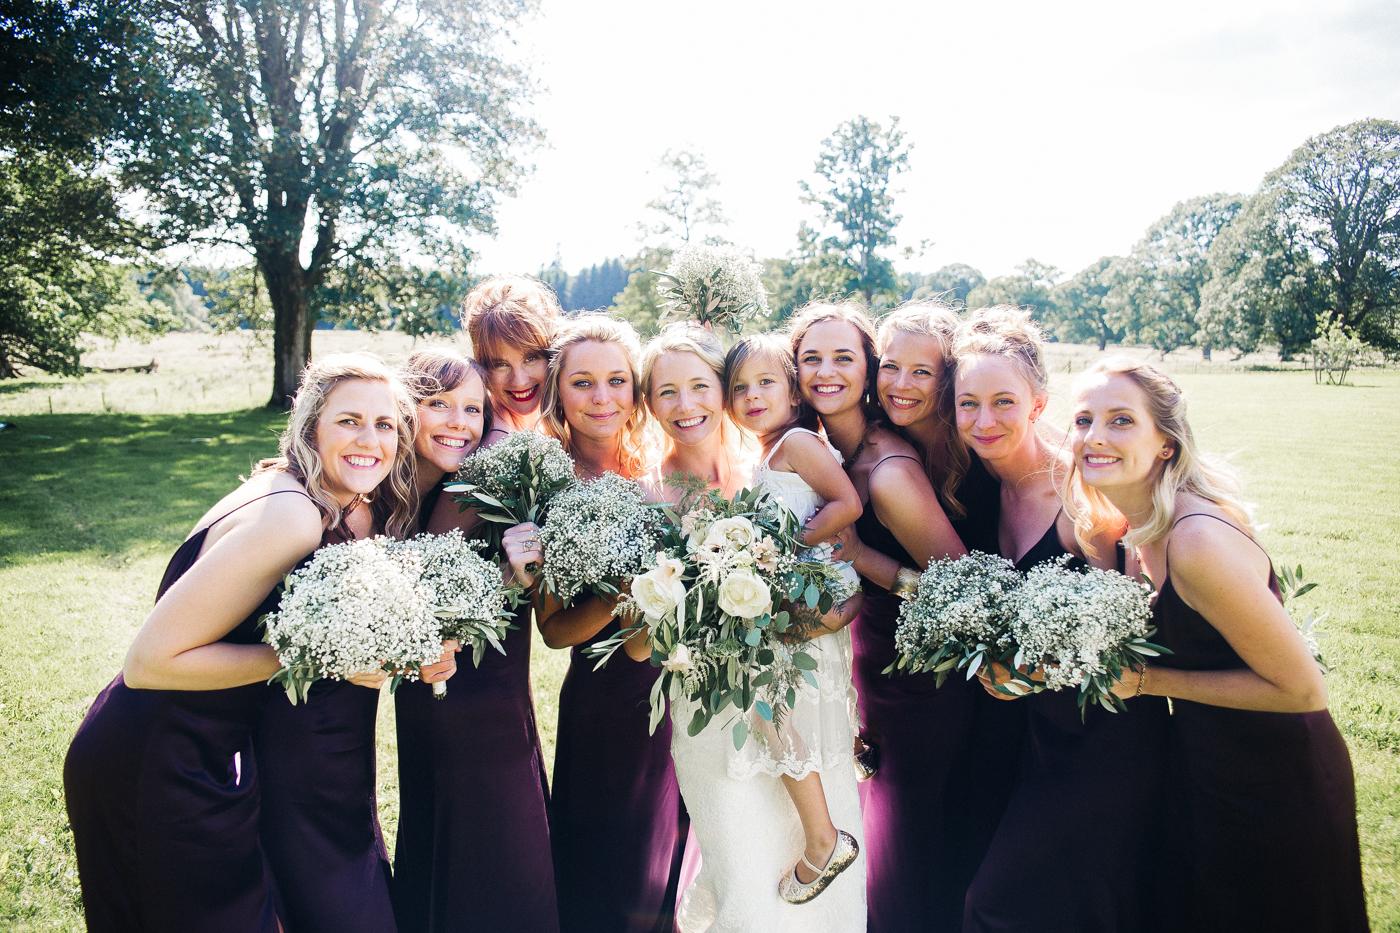 teesside-middlesbrough-north-east-wedding-photographer-creative-wedding-venues-0034.jpg